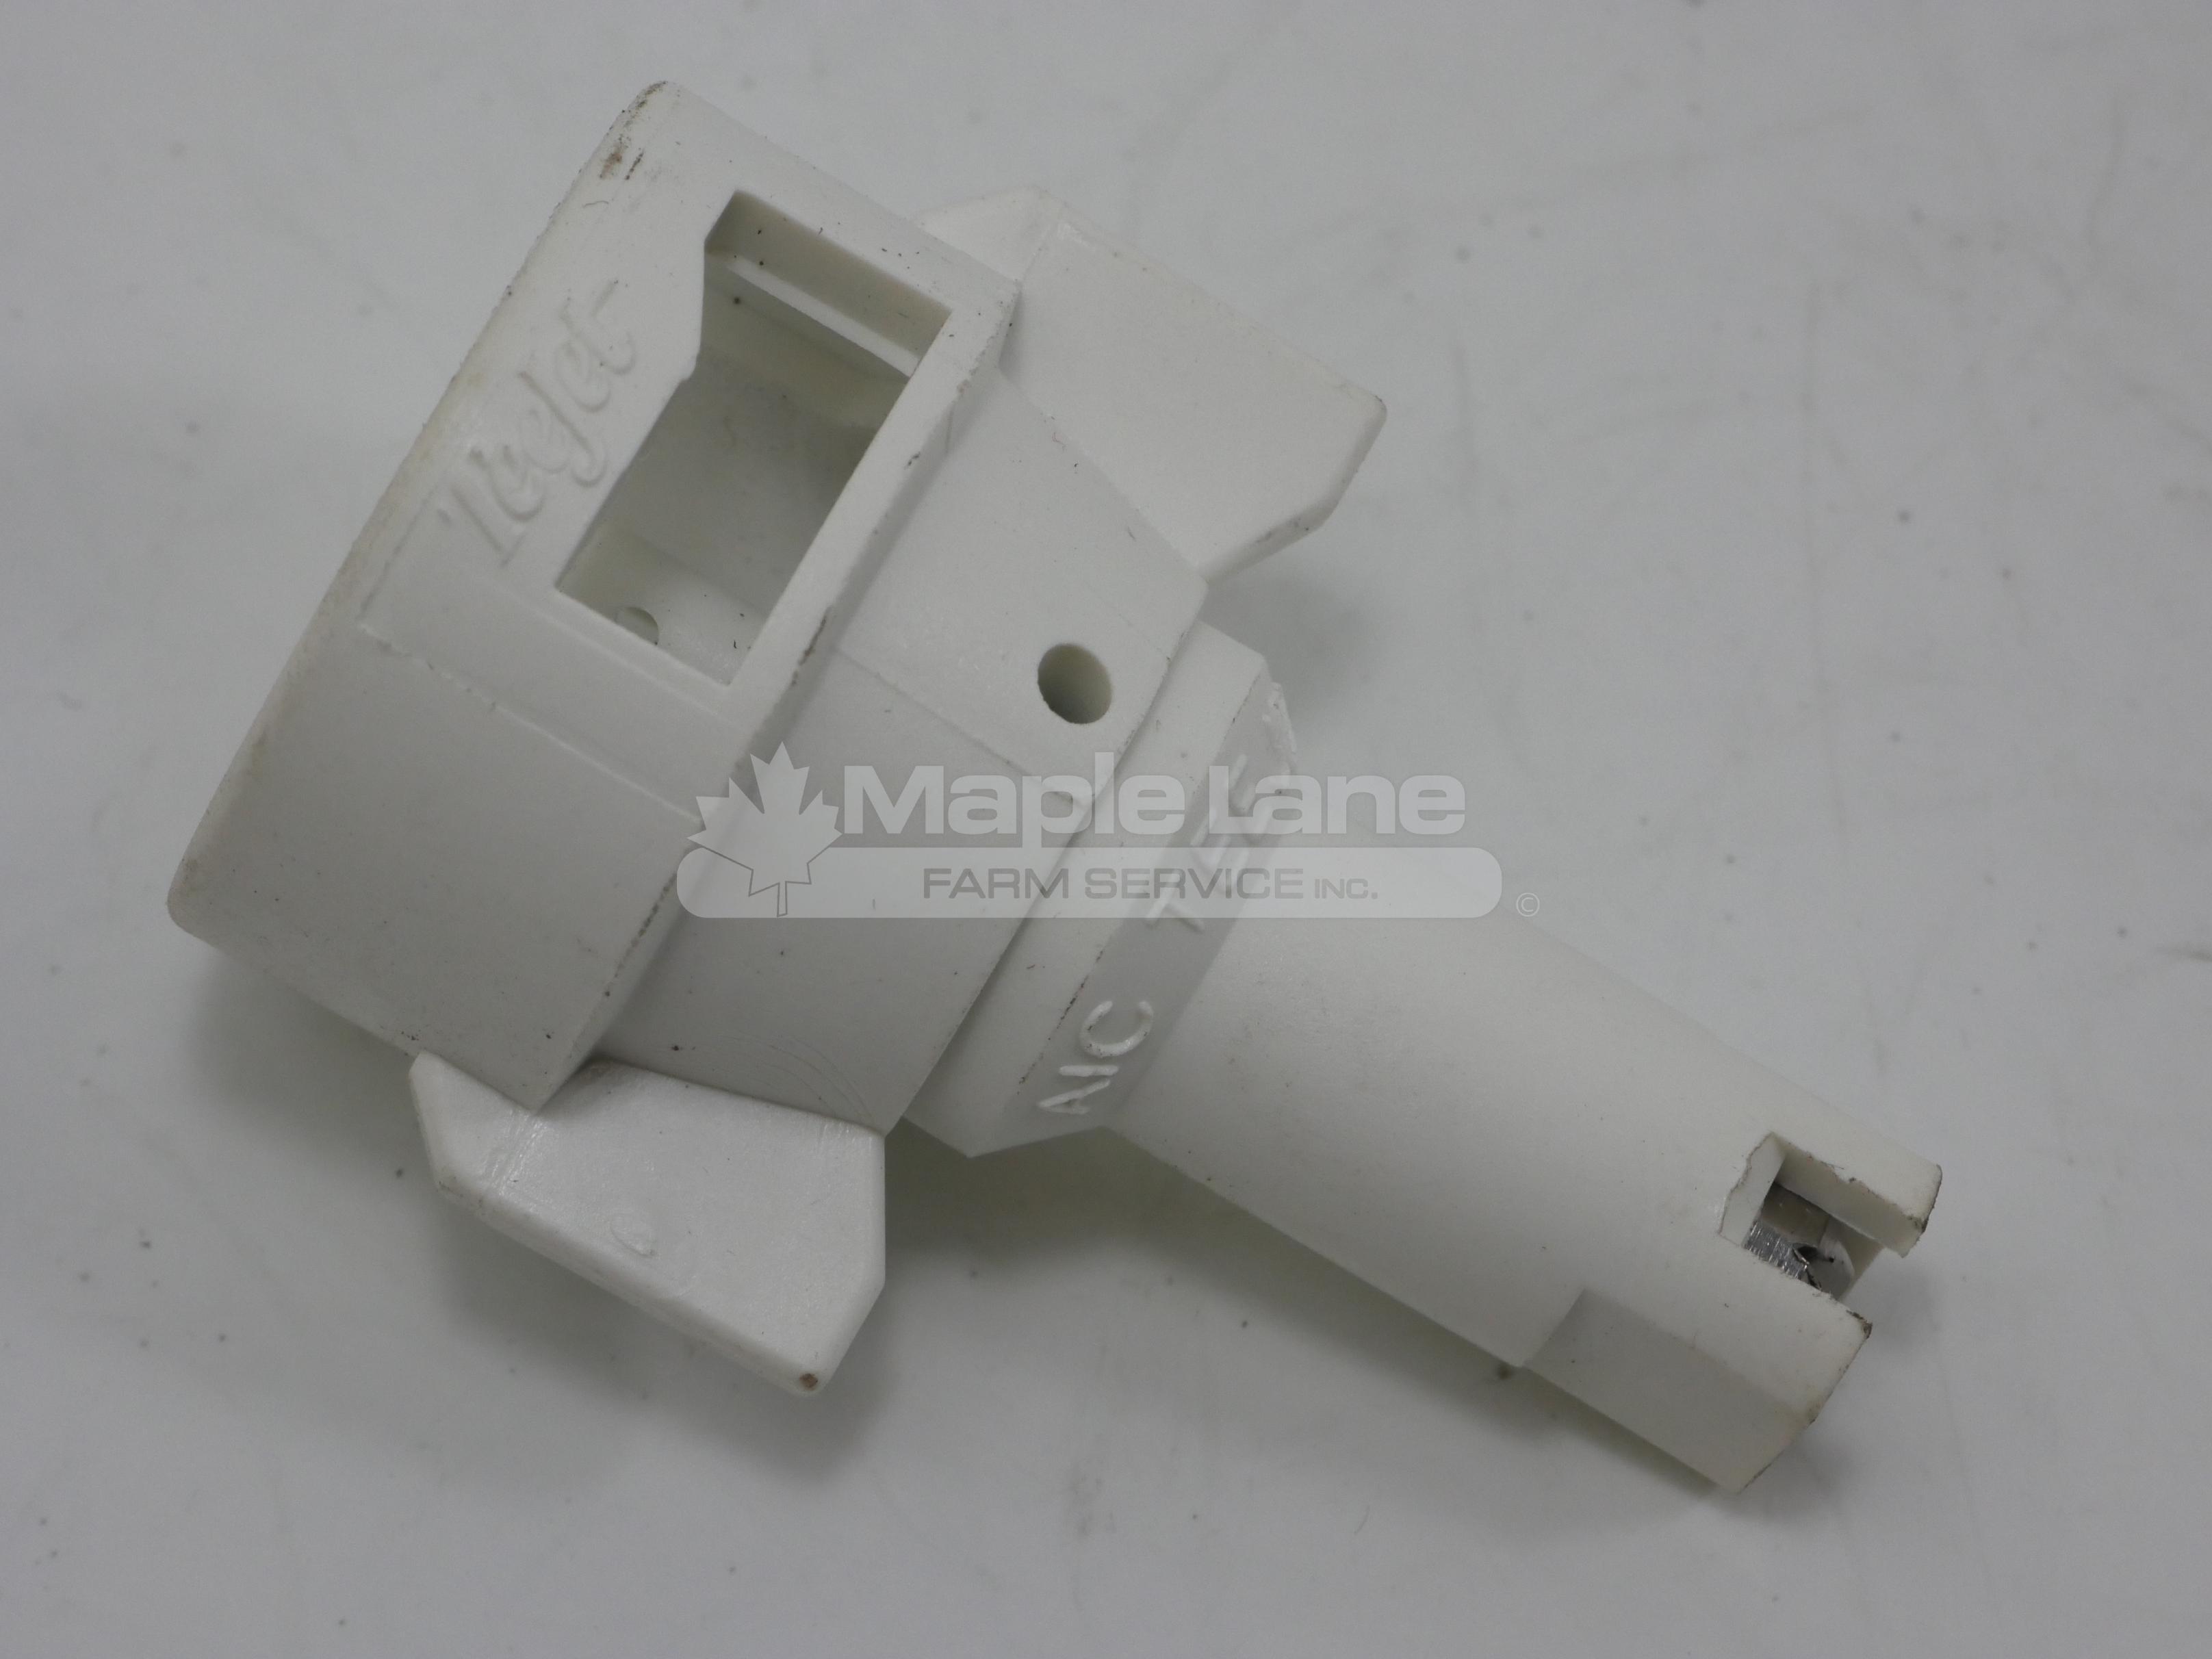 AG426293 Tip AIC11008-VS